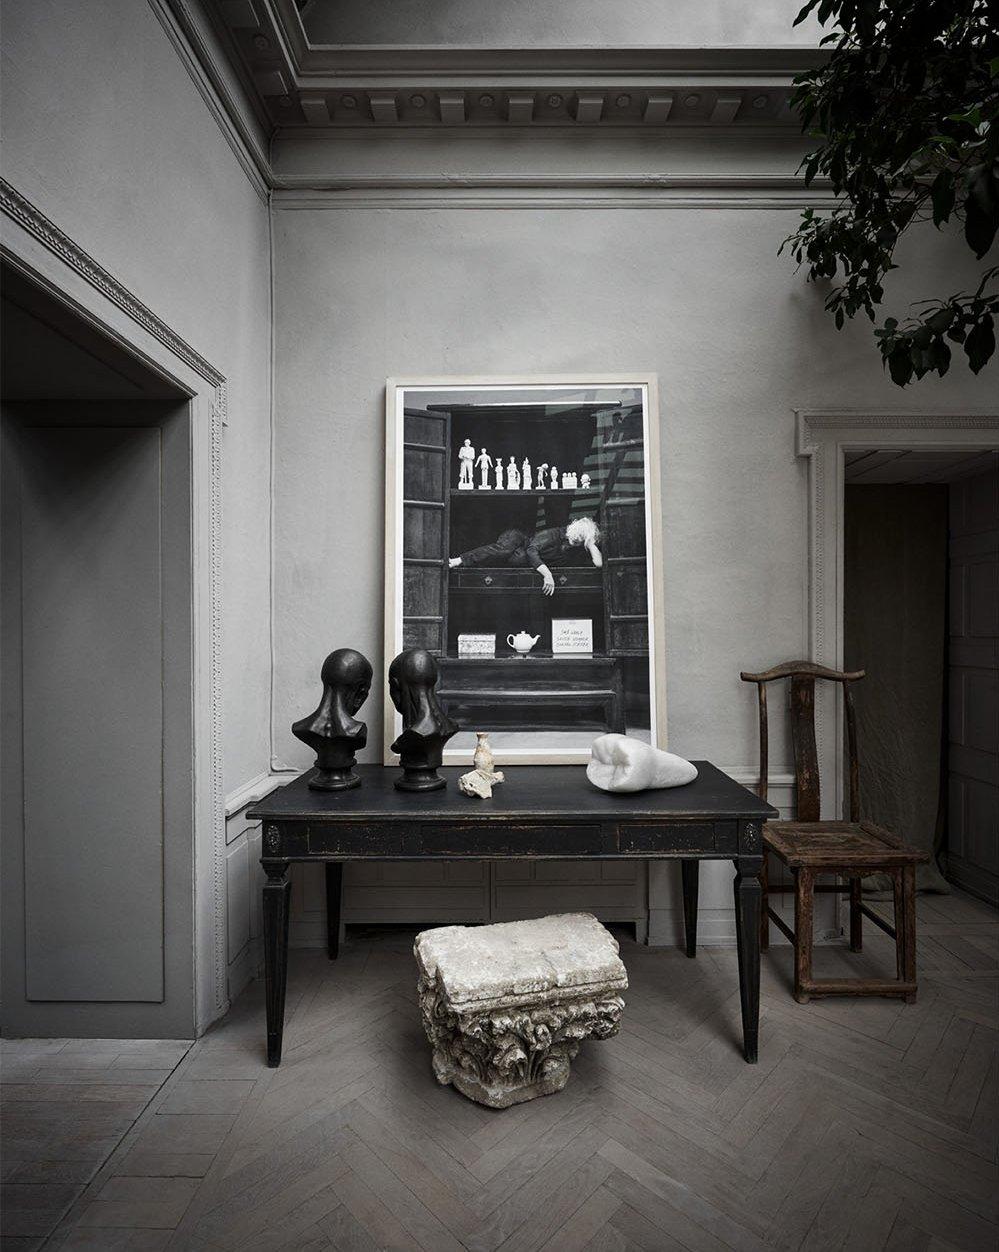 Antique furniture, Kirsten Justesen art piece at Studio oliver gustav sofa